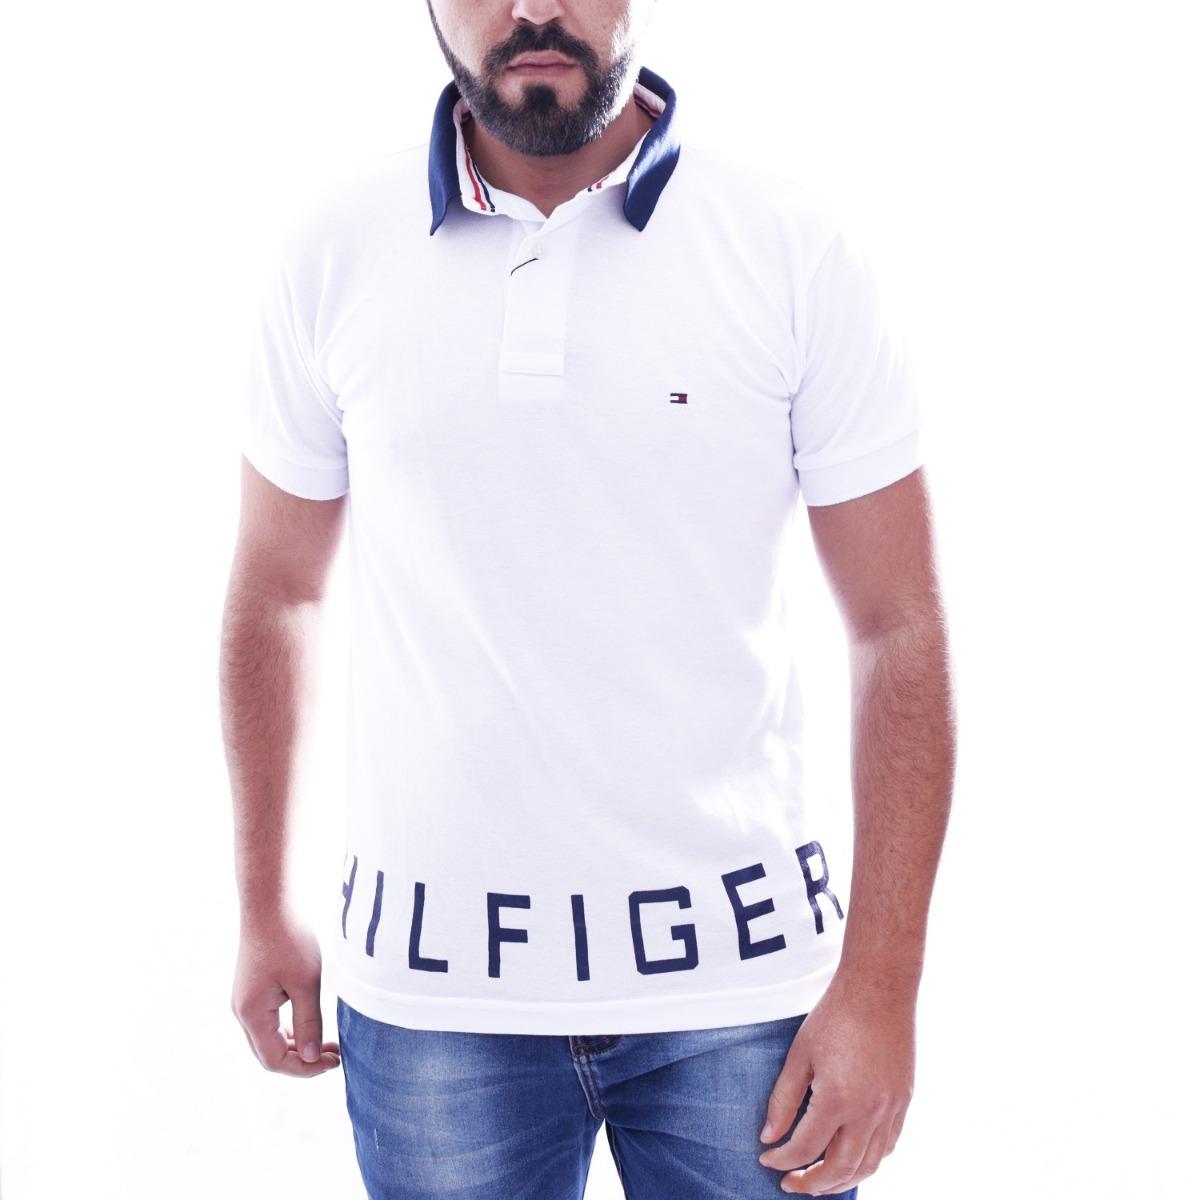 camisa polo tommy hilfiger masc custom fit branca estampada. Carregando zoom . 6b5c7ea15eb0a